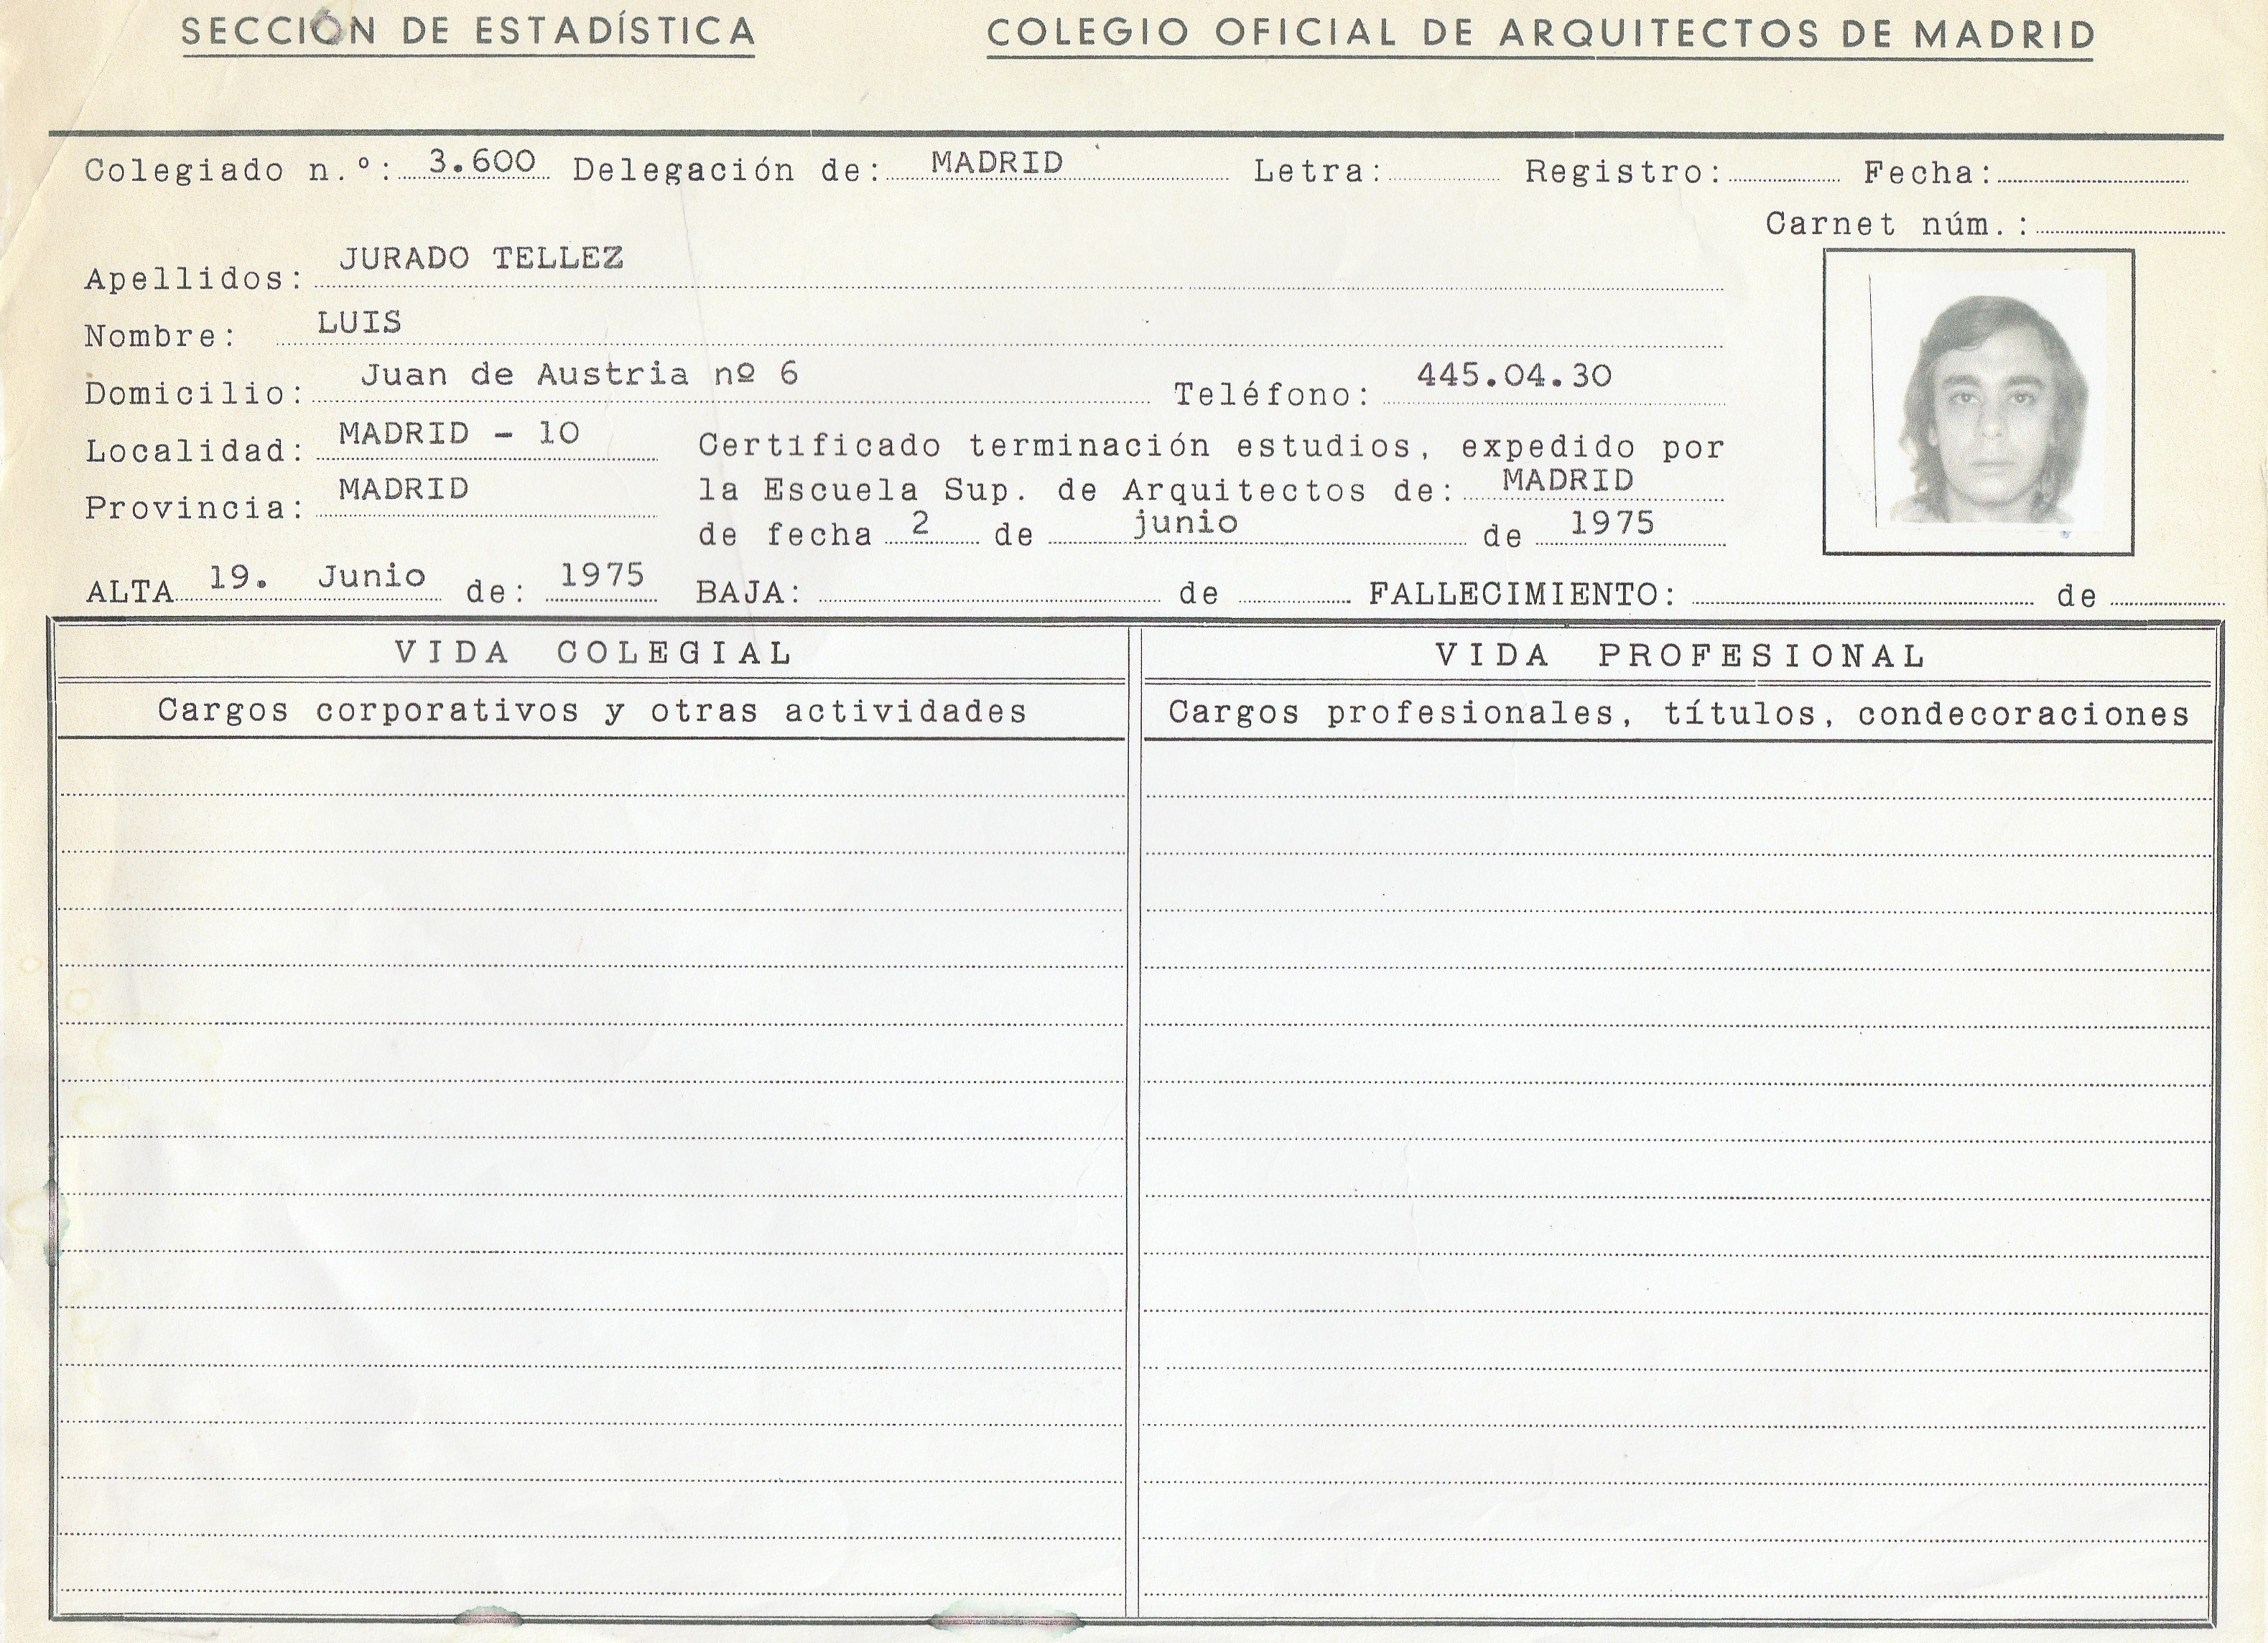 Luis Jurado en ficha COAM